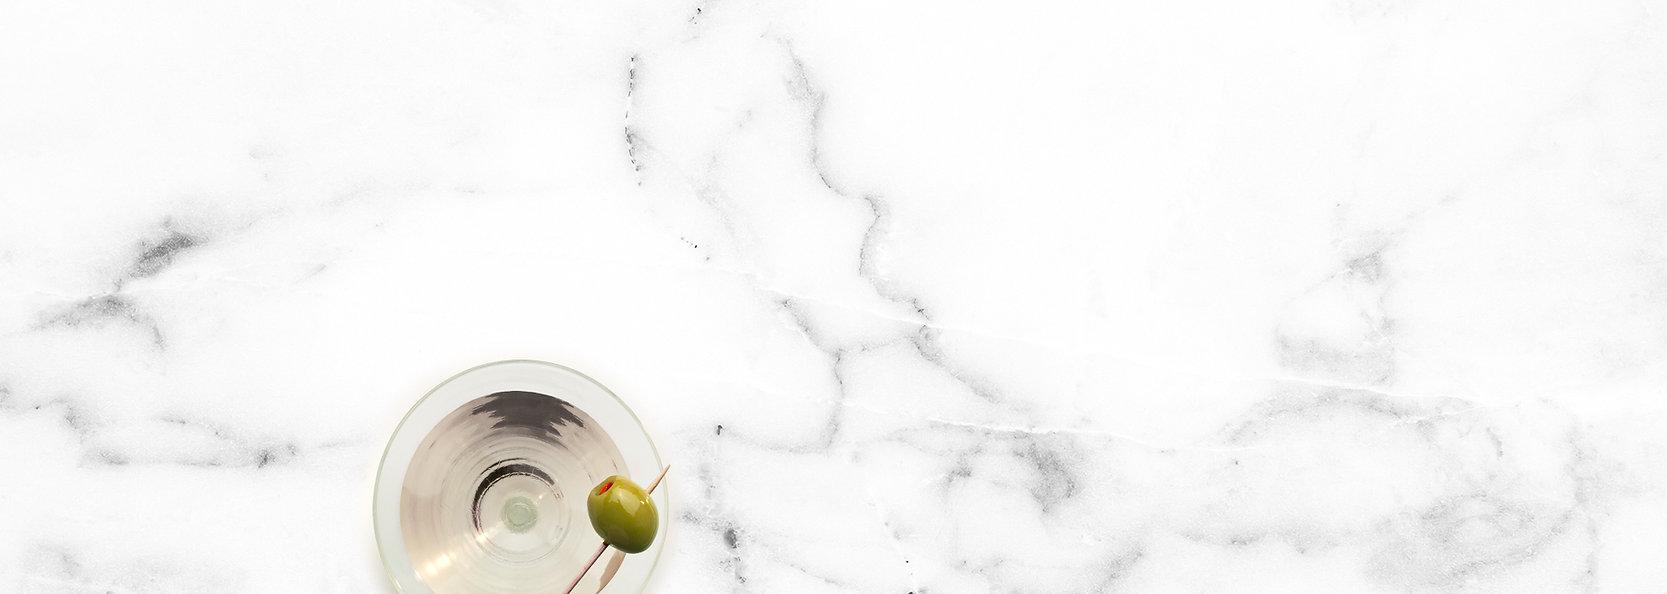 Martini on Marble